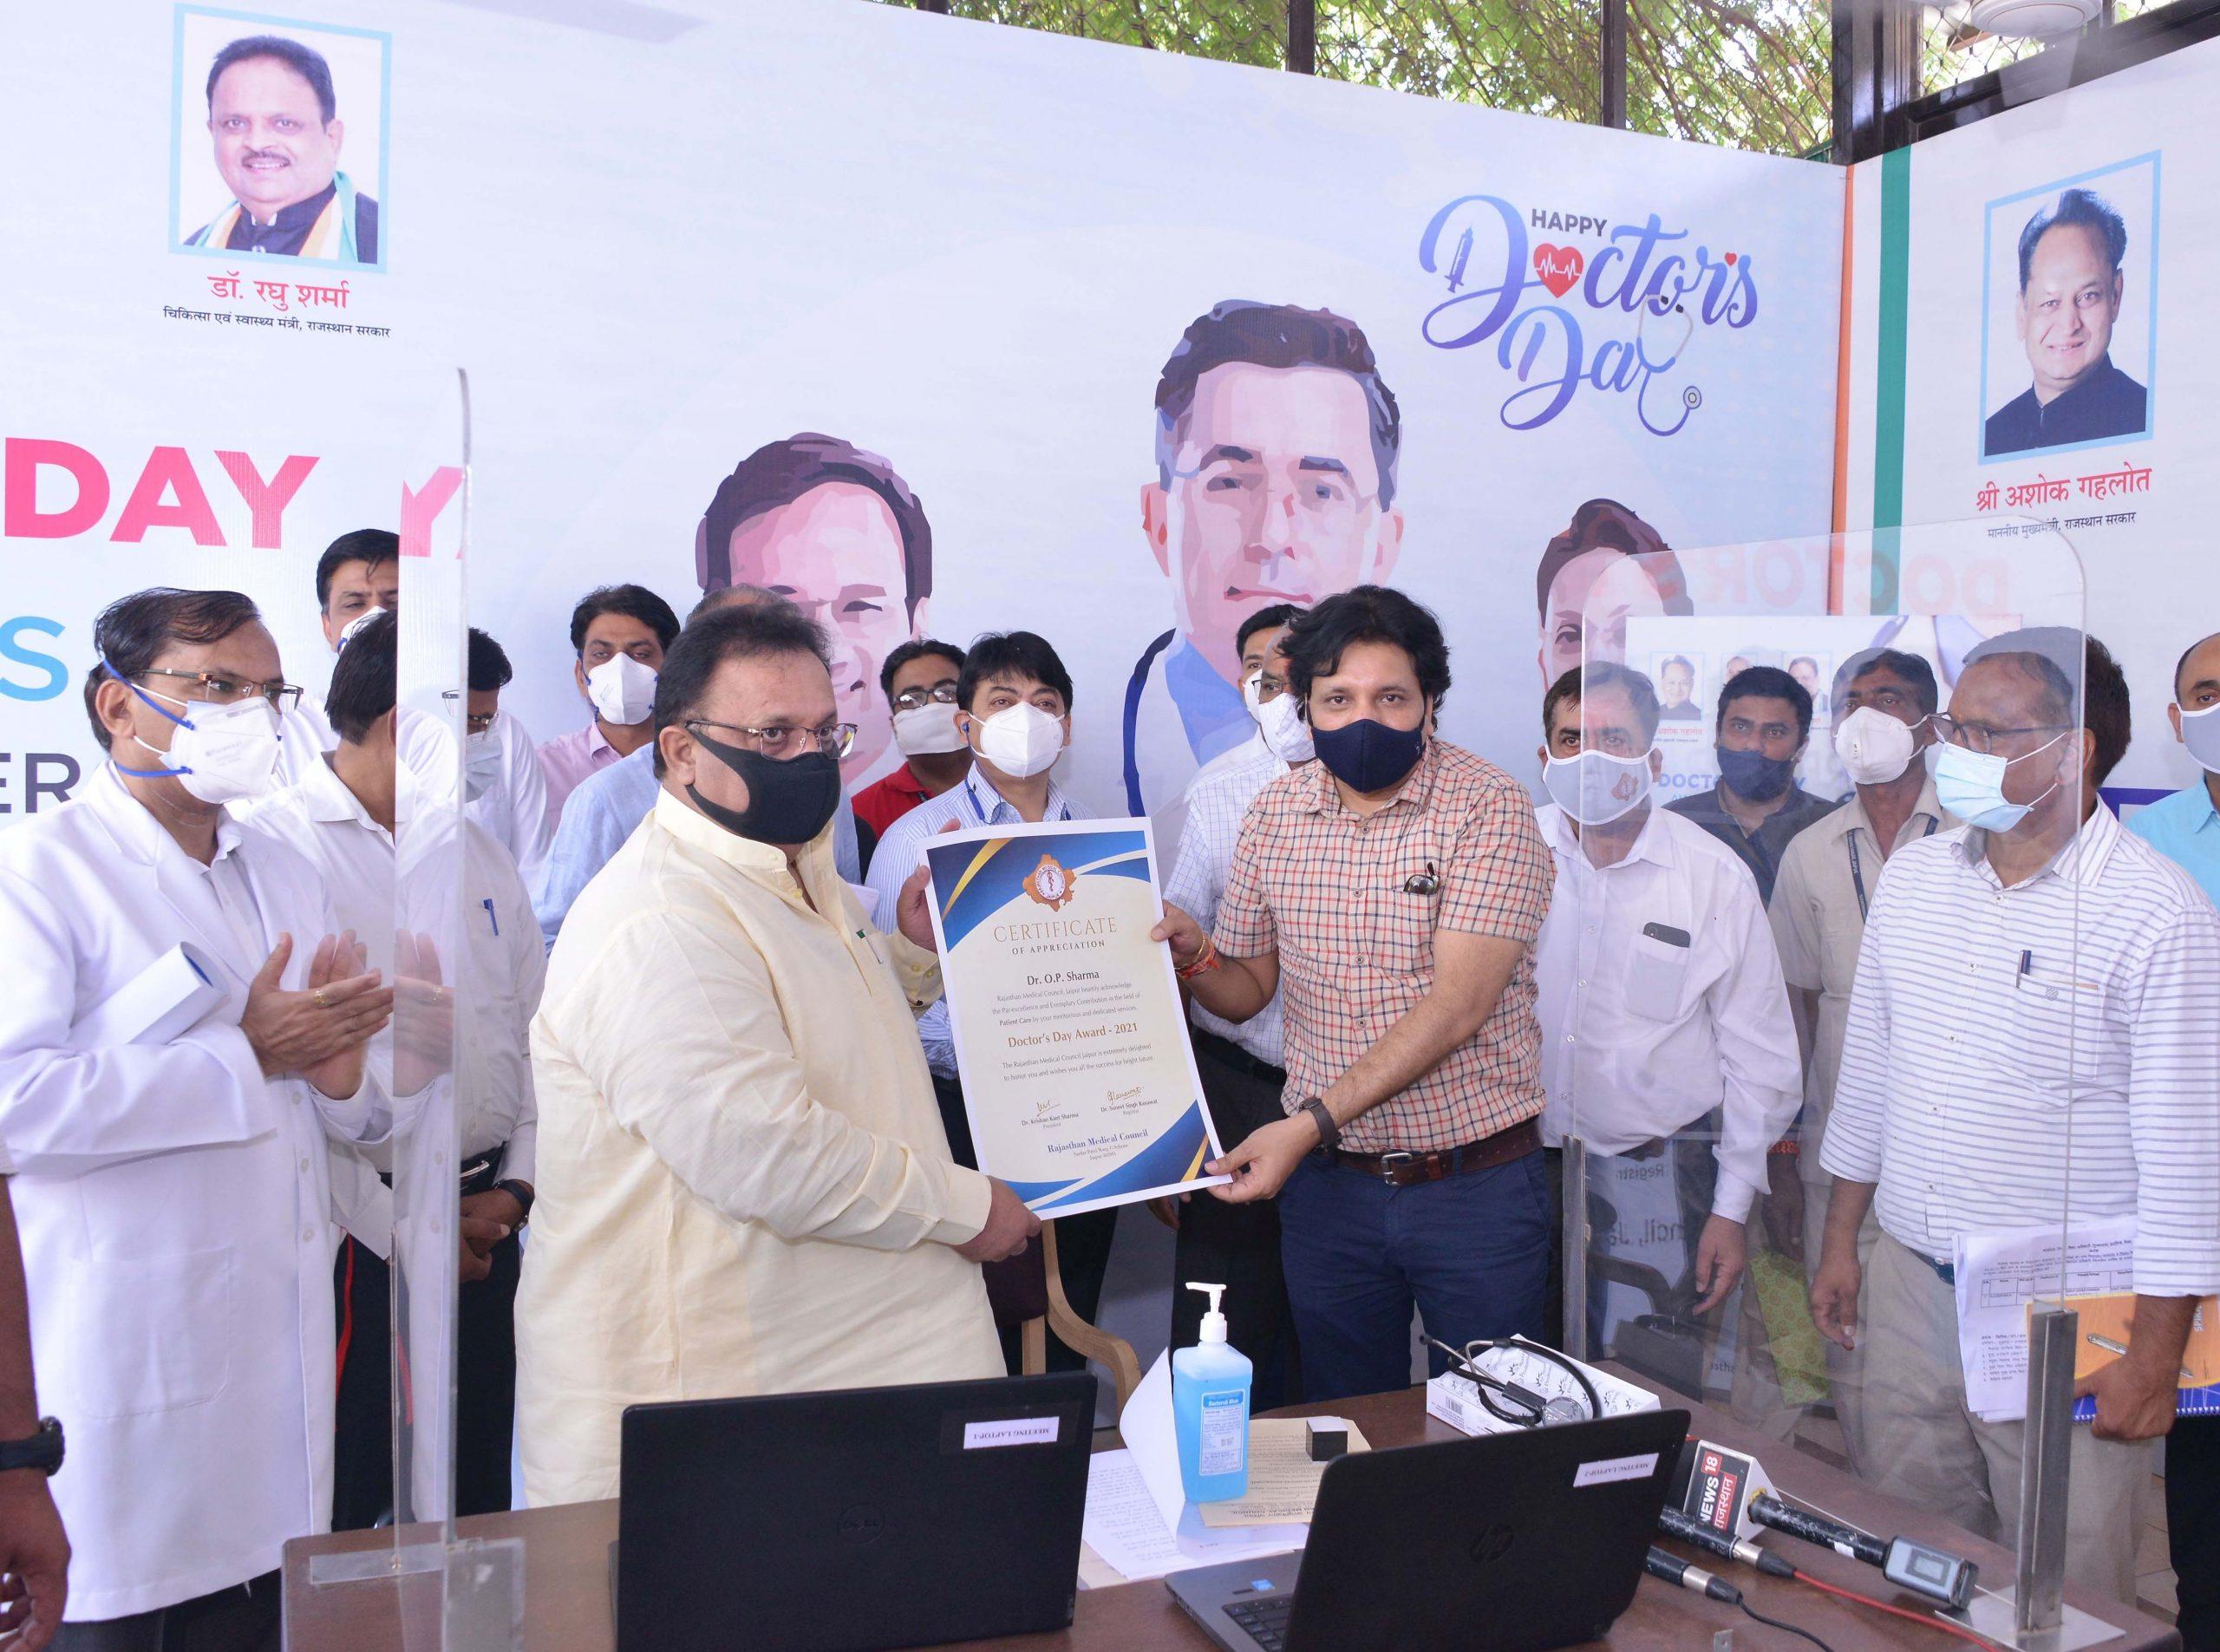 Rajasthan news, Doctors Day, Doctors Memorial, SMS Hospital, dr raghu sharma, Doctors Day 2021, Doctors Day NEWS, Health Minister, Doctors Memorial,